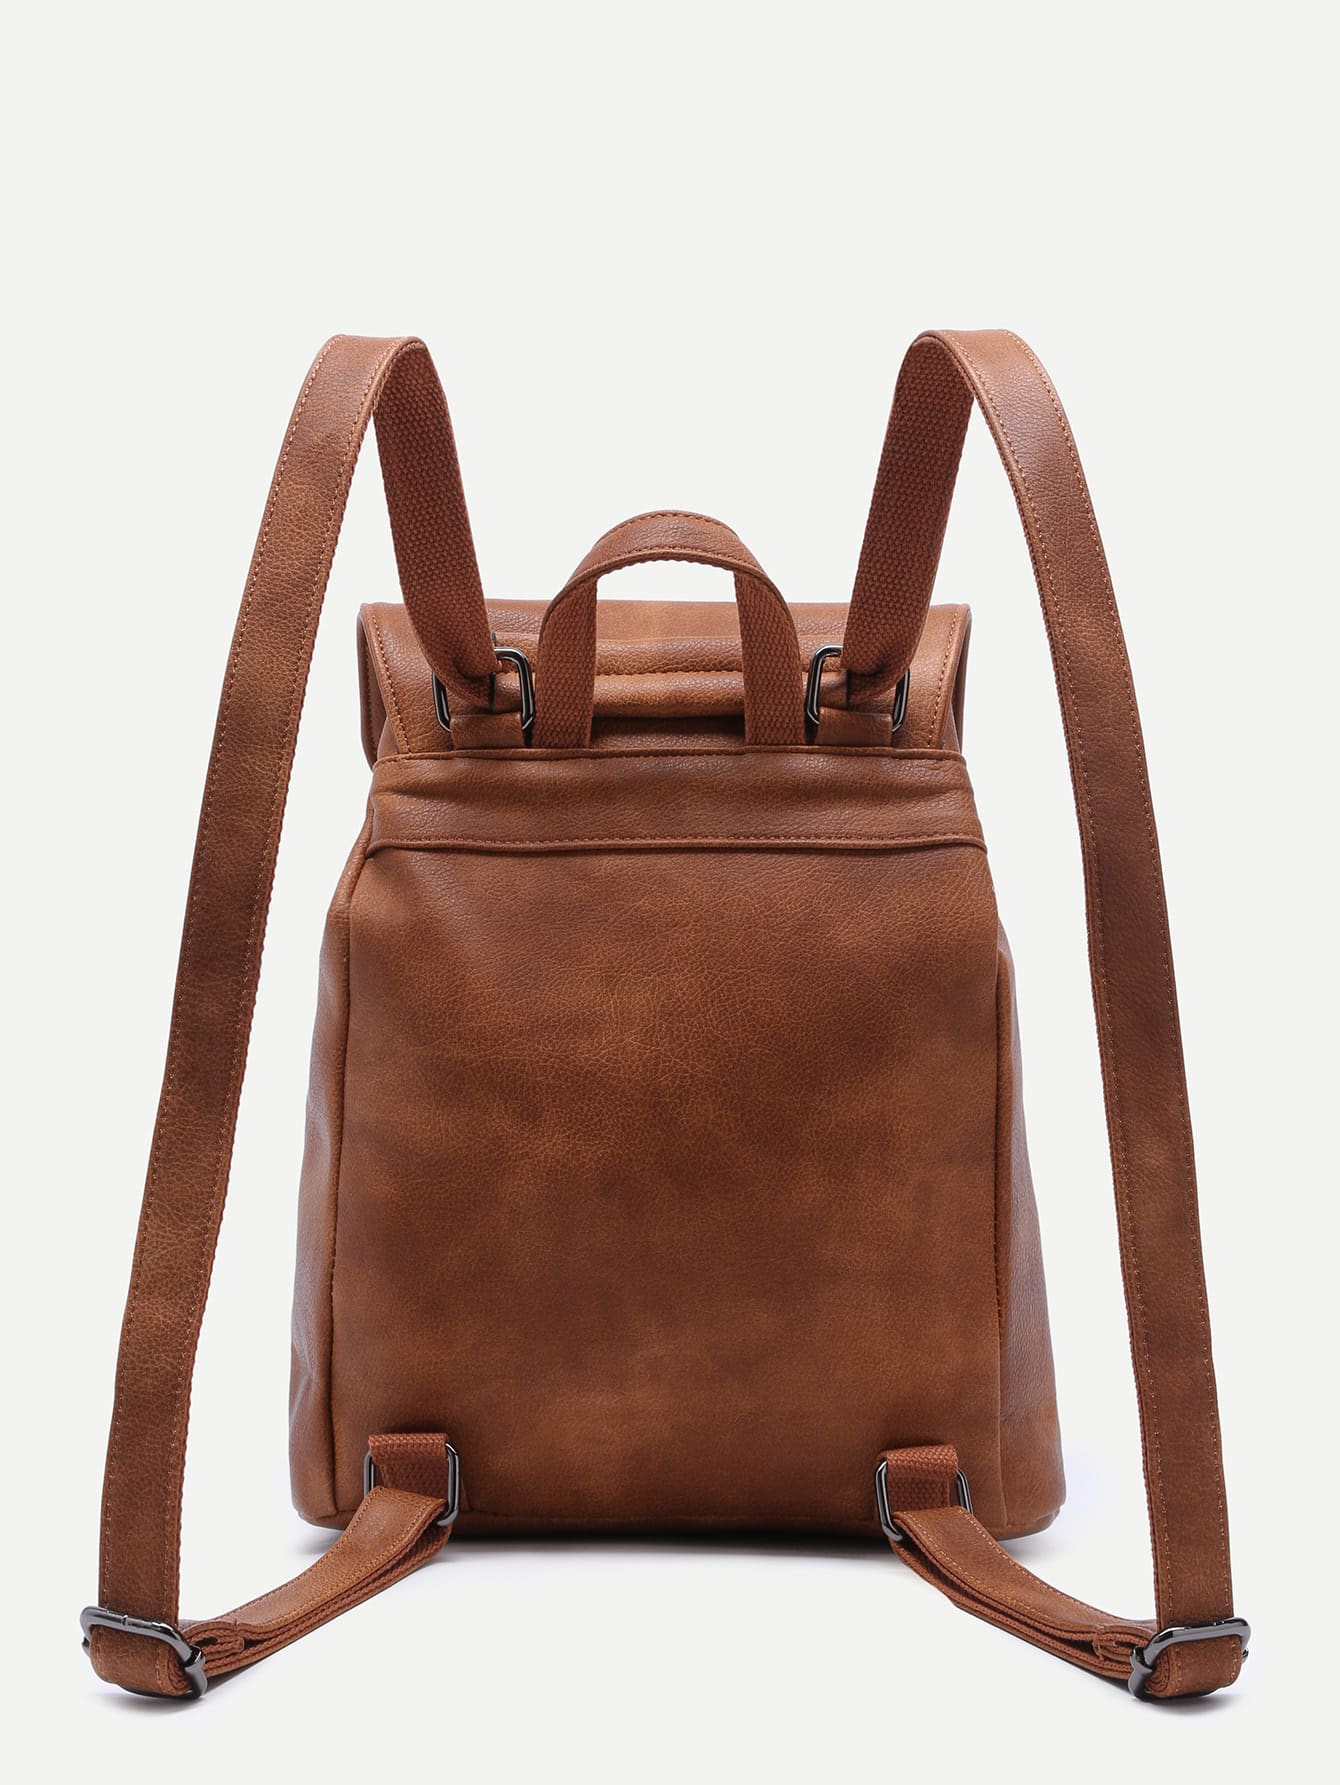 bag161014905_2